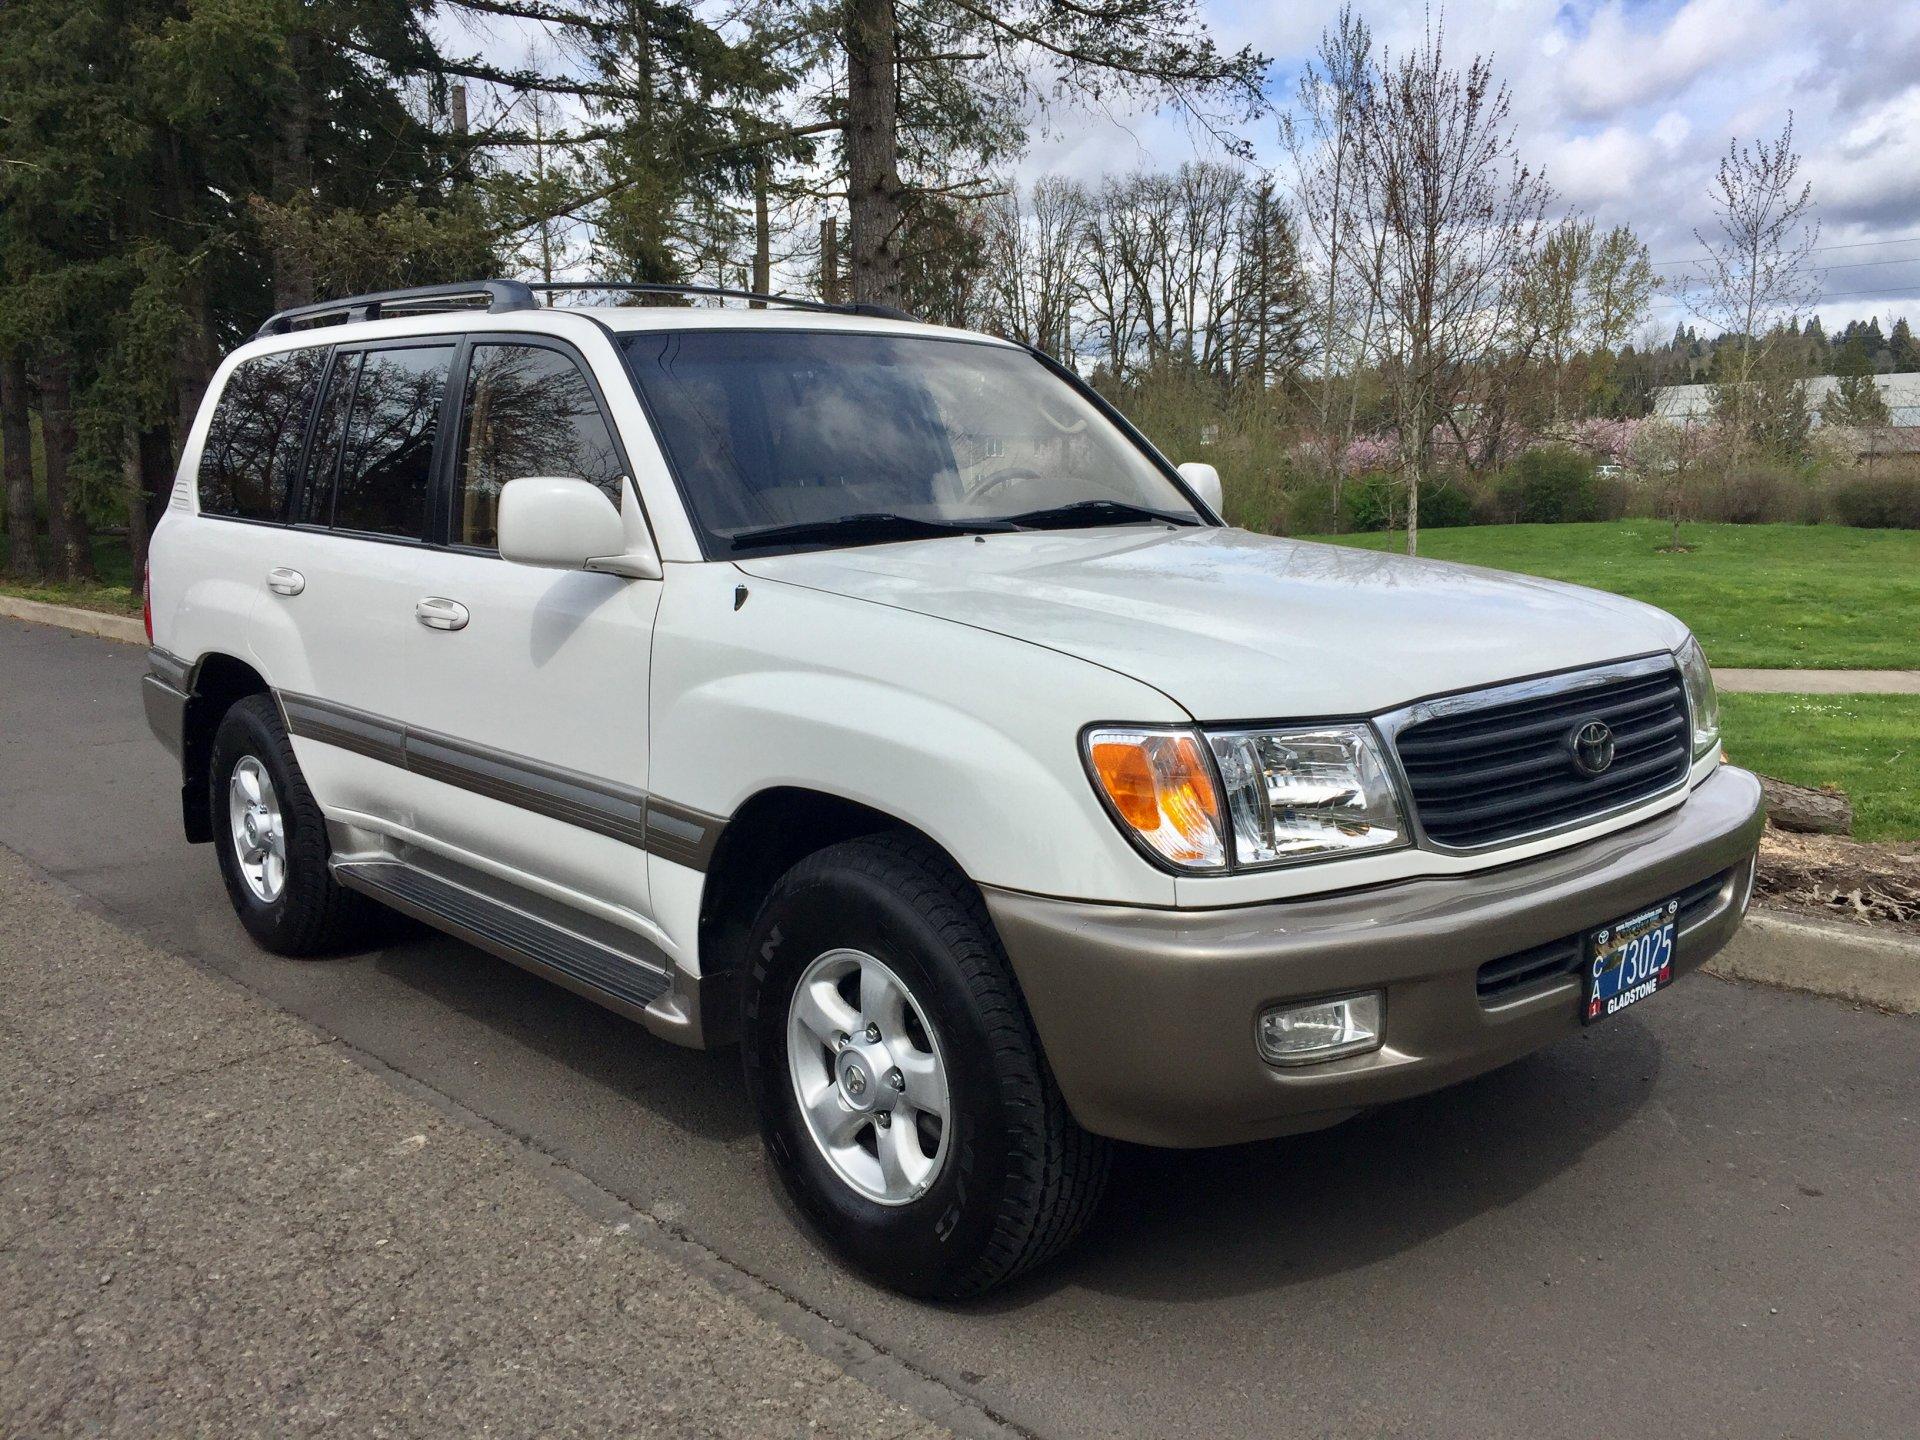 For Sale 2000 Land Cruiser Super Low Miles Portland